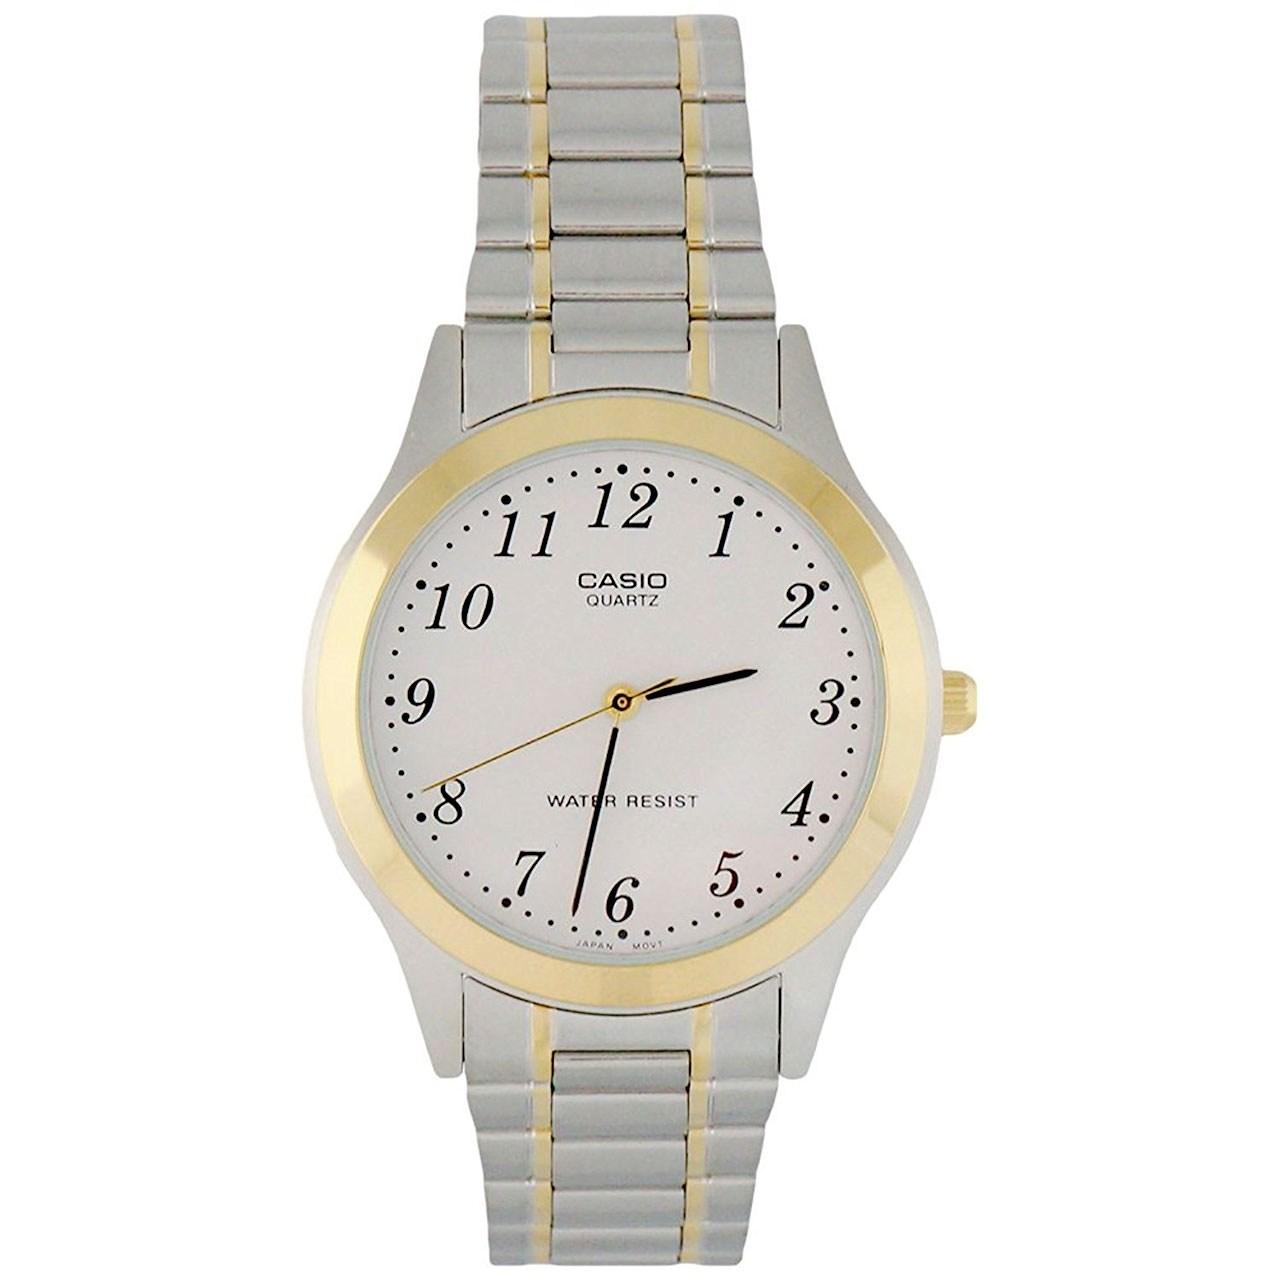 ساعت  کاسیو مدل MTP-1128G-7BRDF